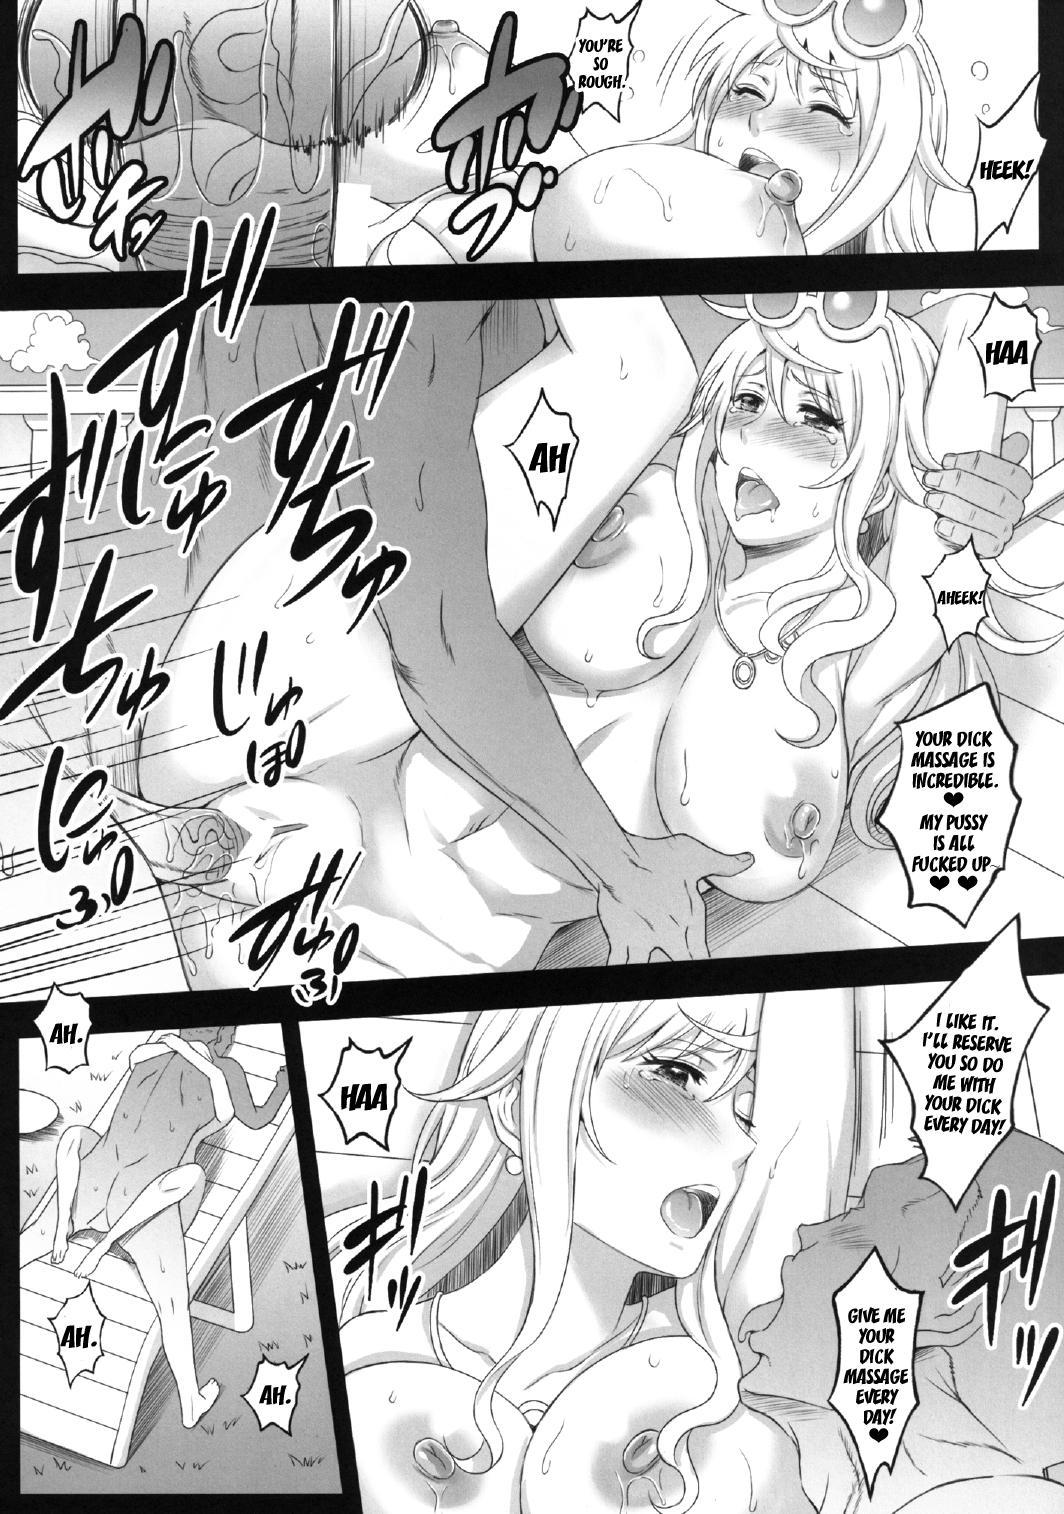 Rakuen Onna Kaizoku 4 - Woman Pirate in Paradise 18